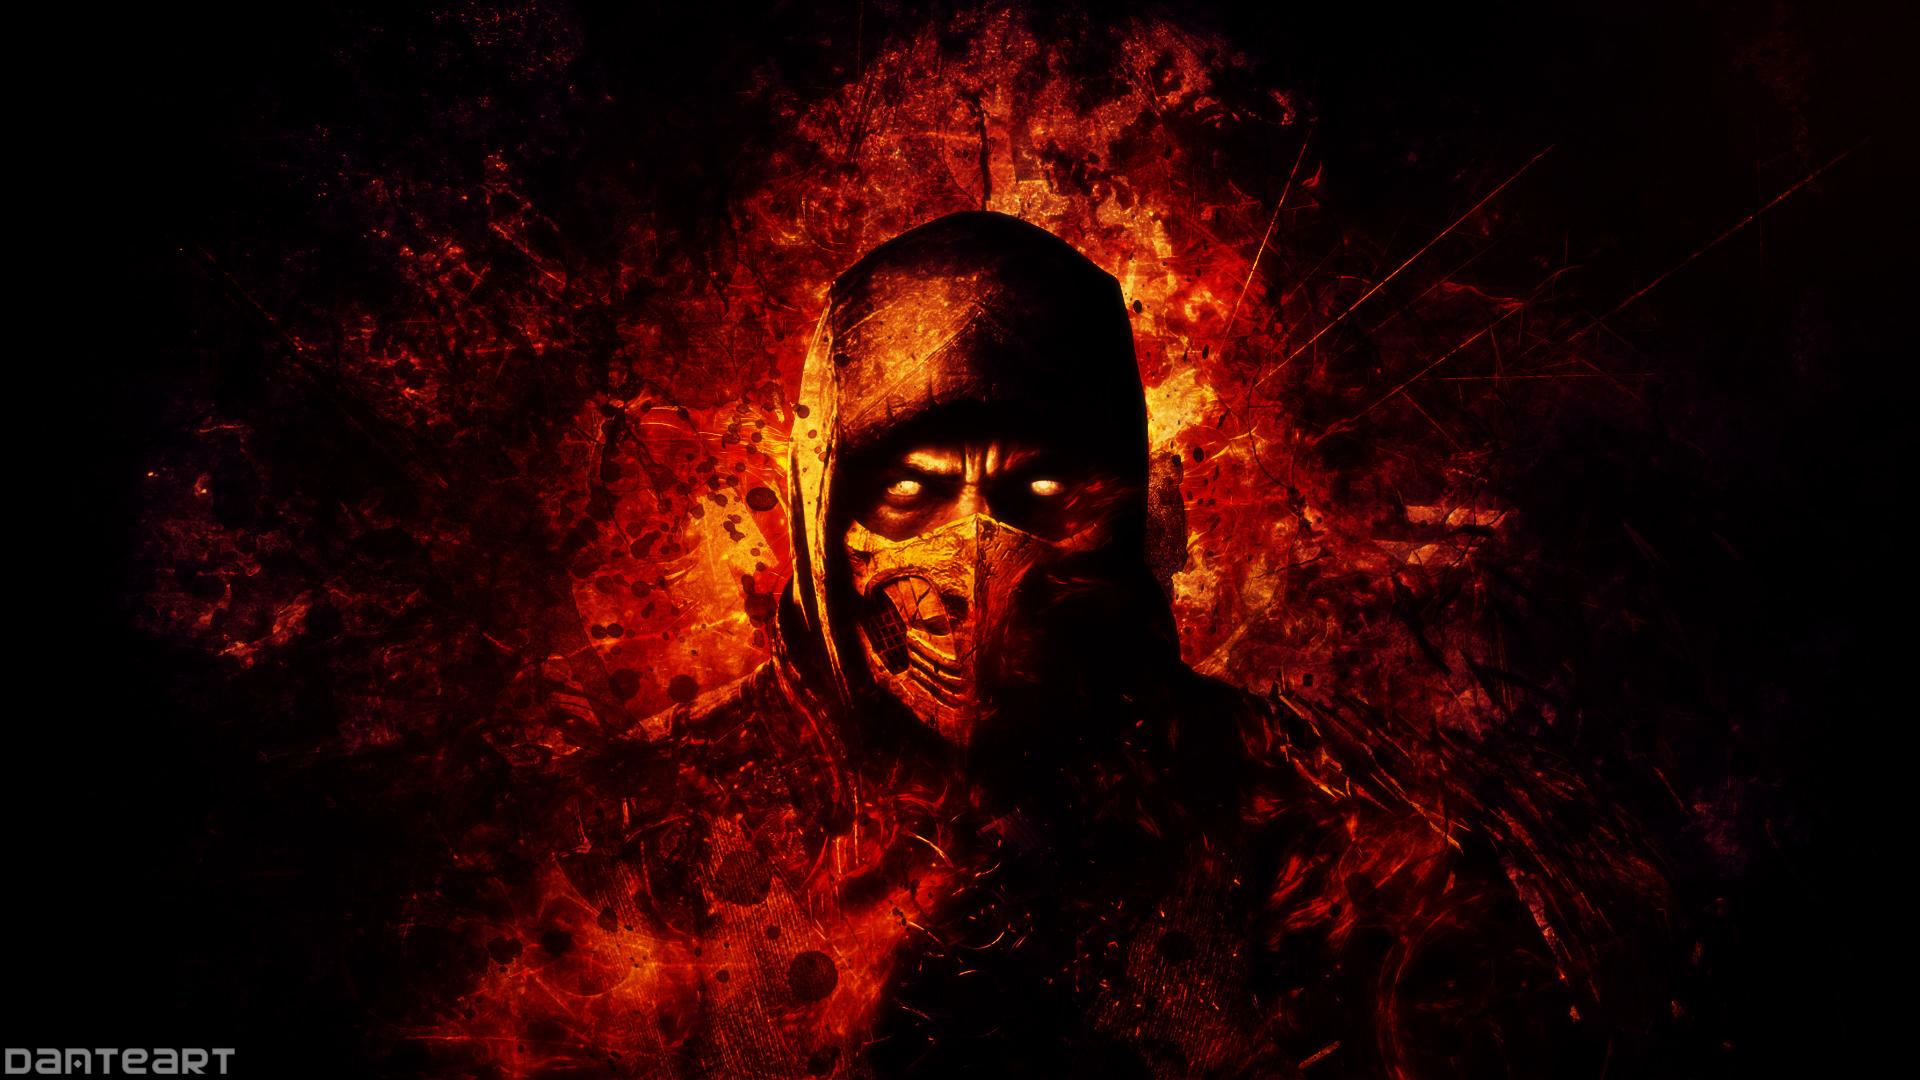 47 Mortal Kombat X Scorpion Wallpapers On Wallpapersafari